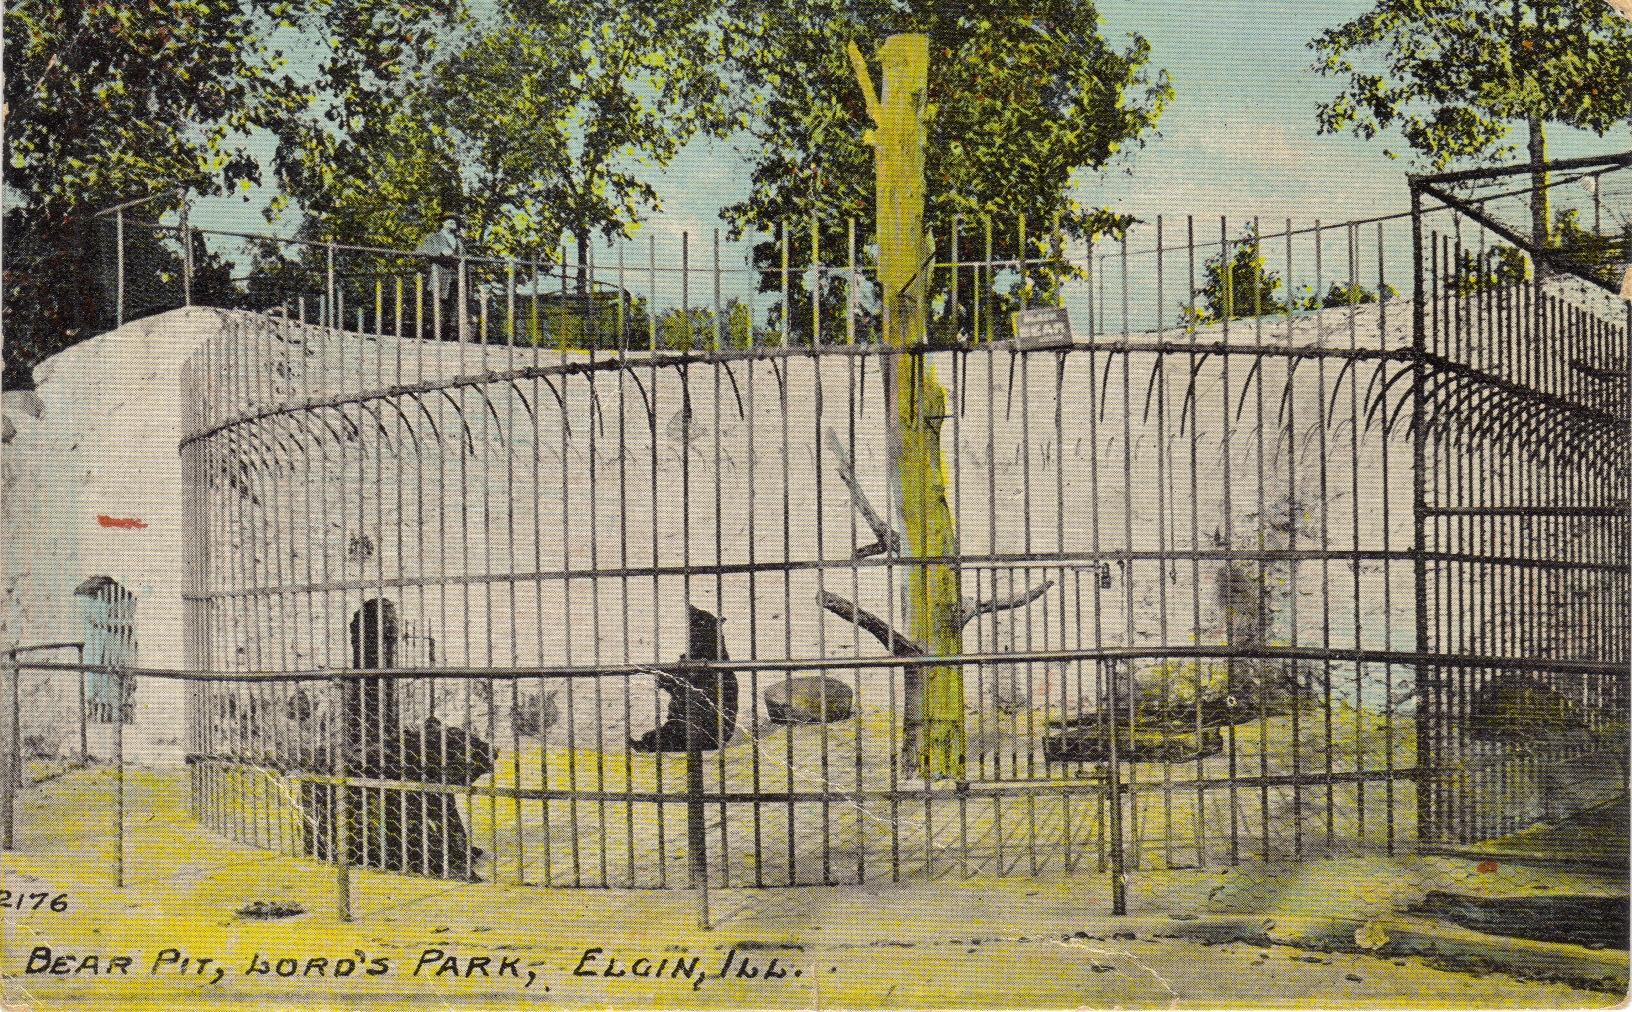 Lords-Park-bear-pit-1905.jpg